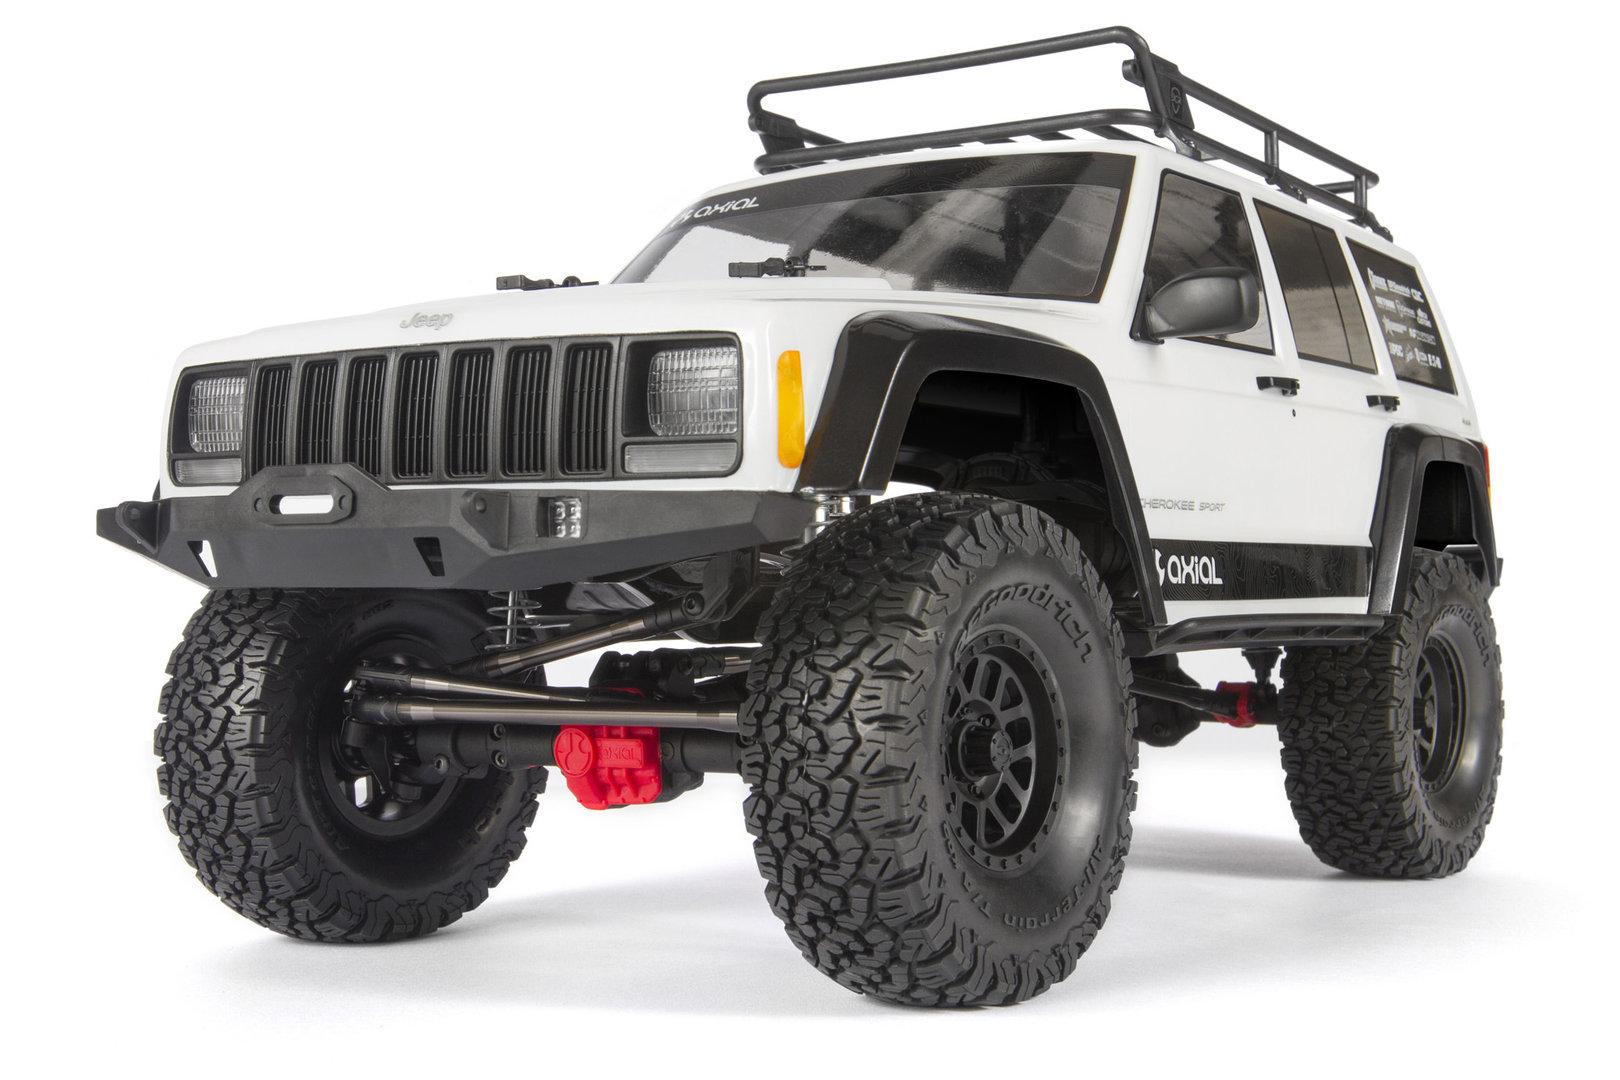 axial scx10 ii 2000 jeep cherokee crawler bausatz kit kaufen. Black Bedroom Furniture Sets. Home Design Ideas